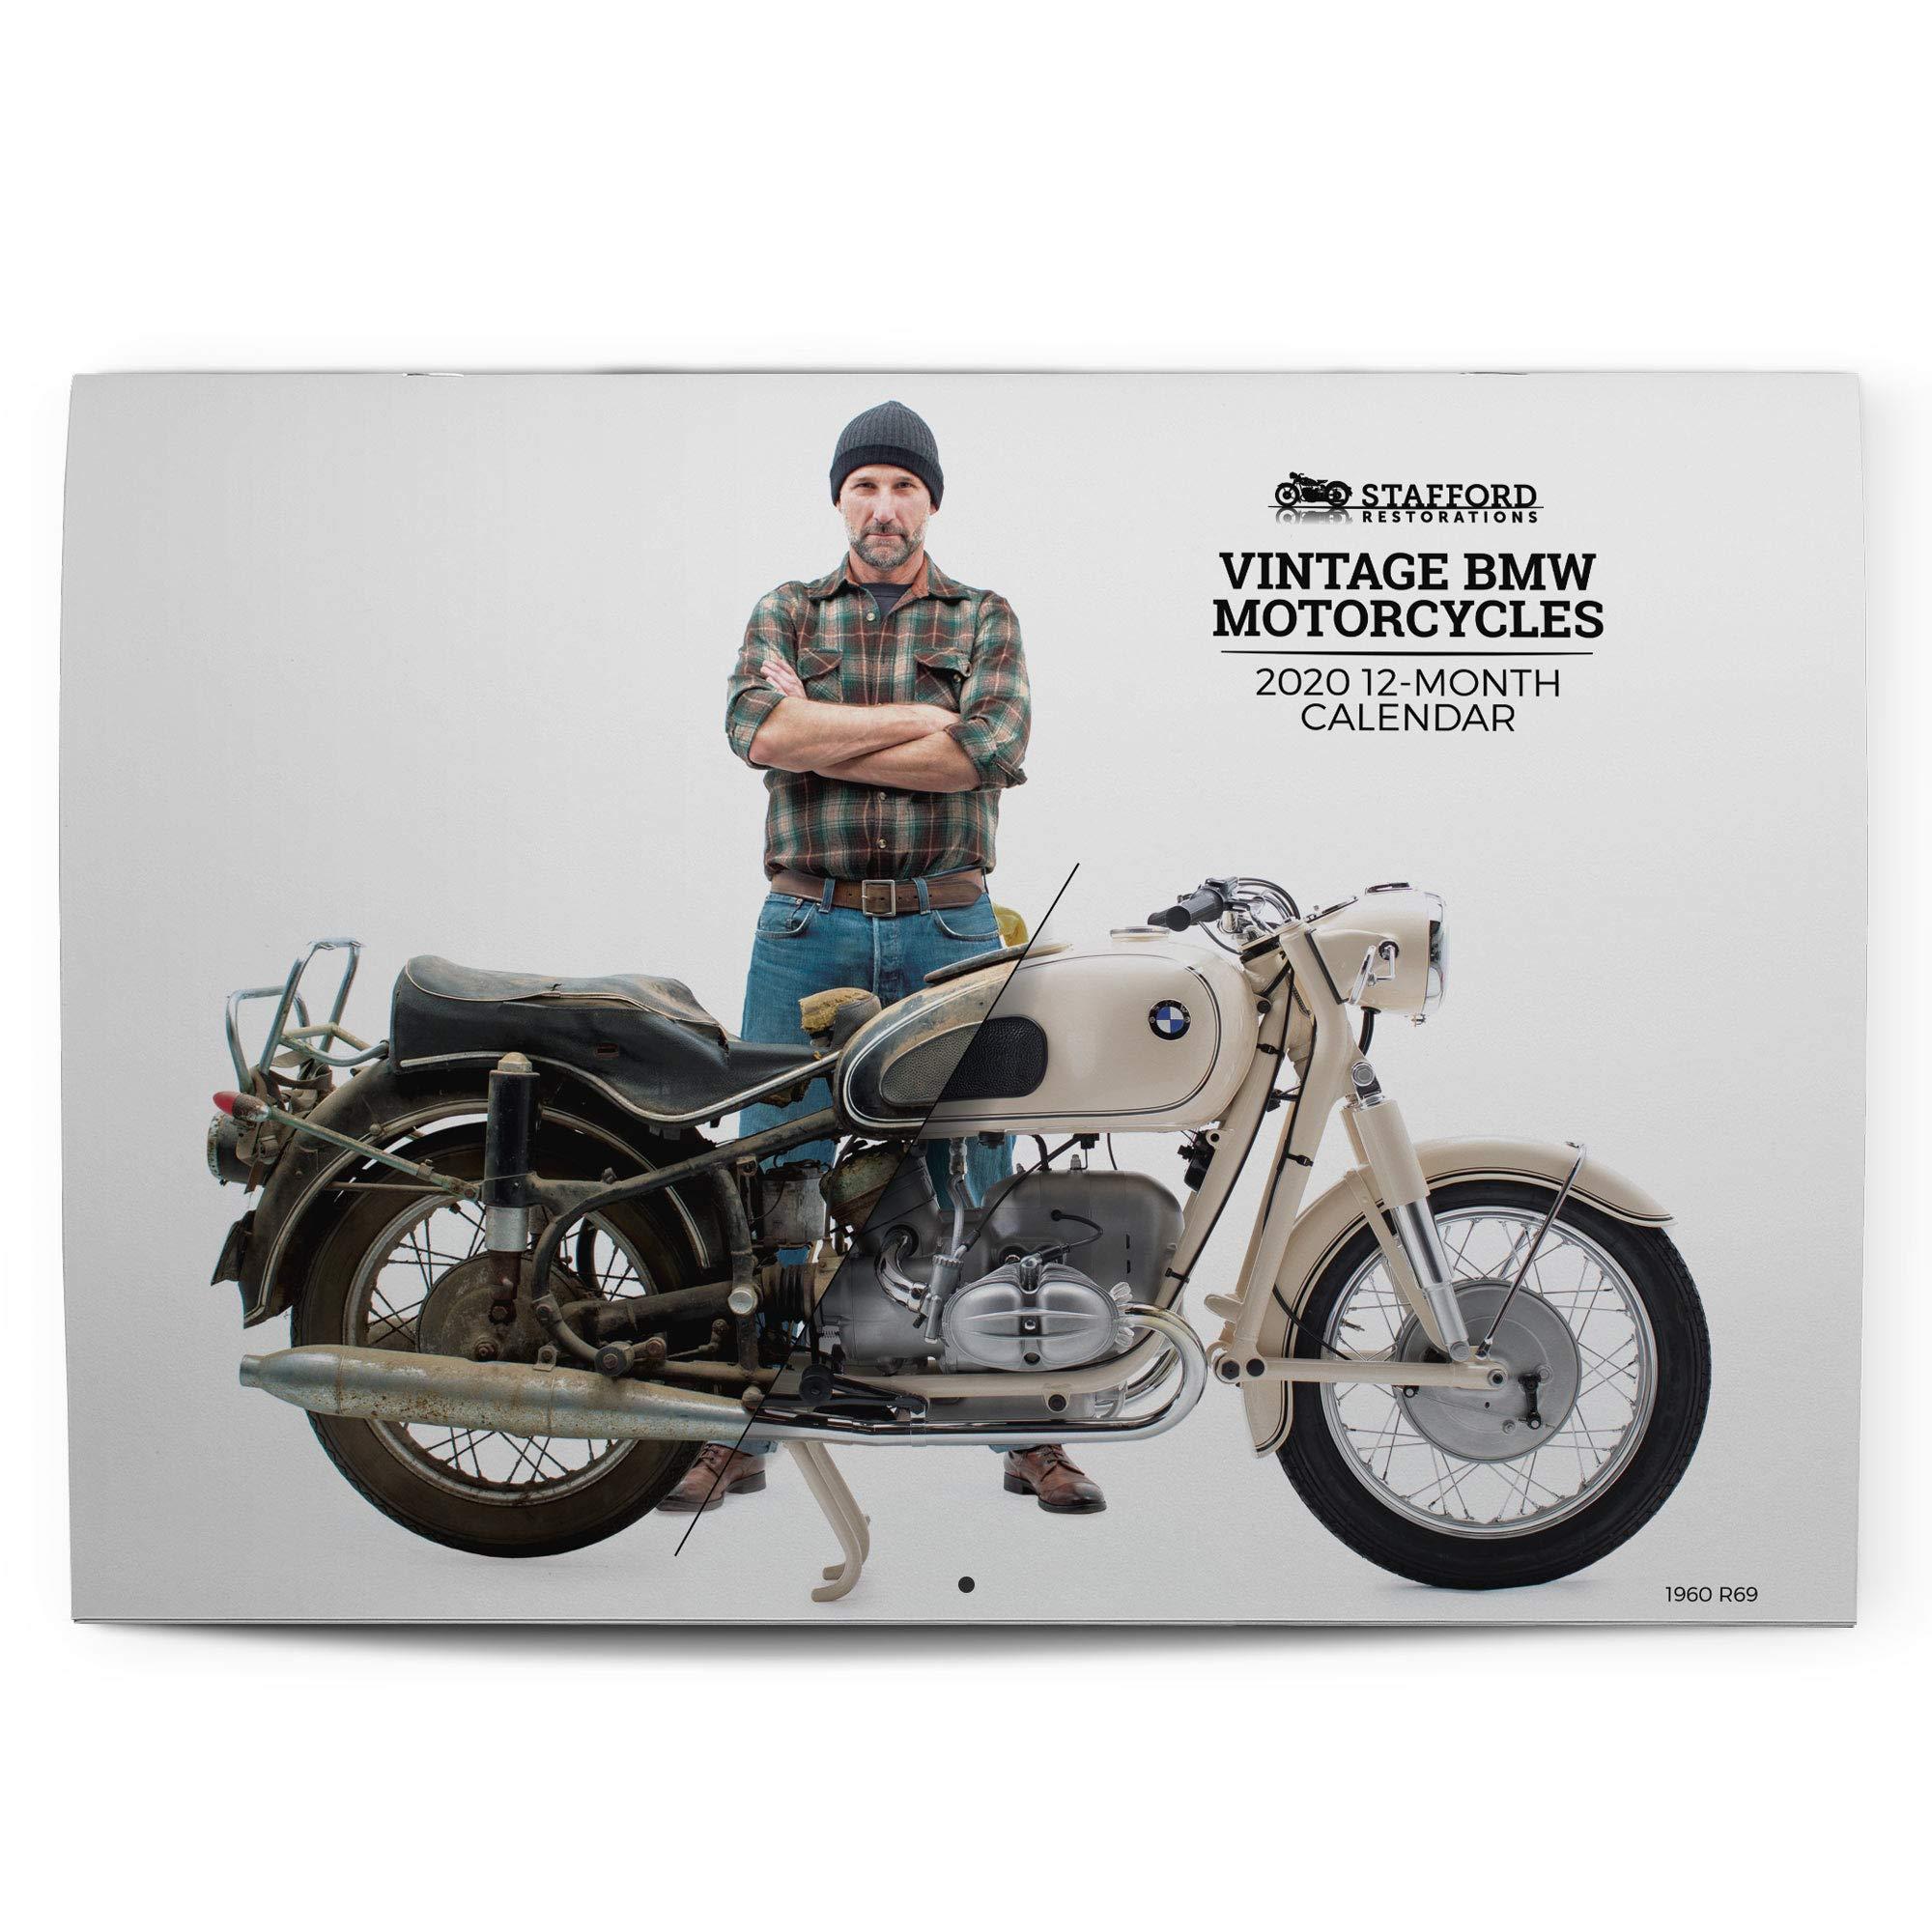 Vintage Bmw Motorcycles 2020 12 Month Wall Calendar Tim Stafford Stafford Restorations Amazon Com Books